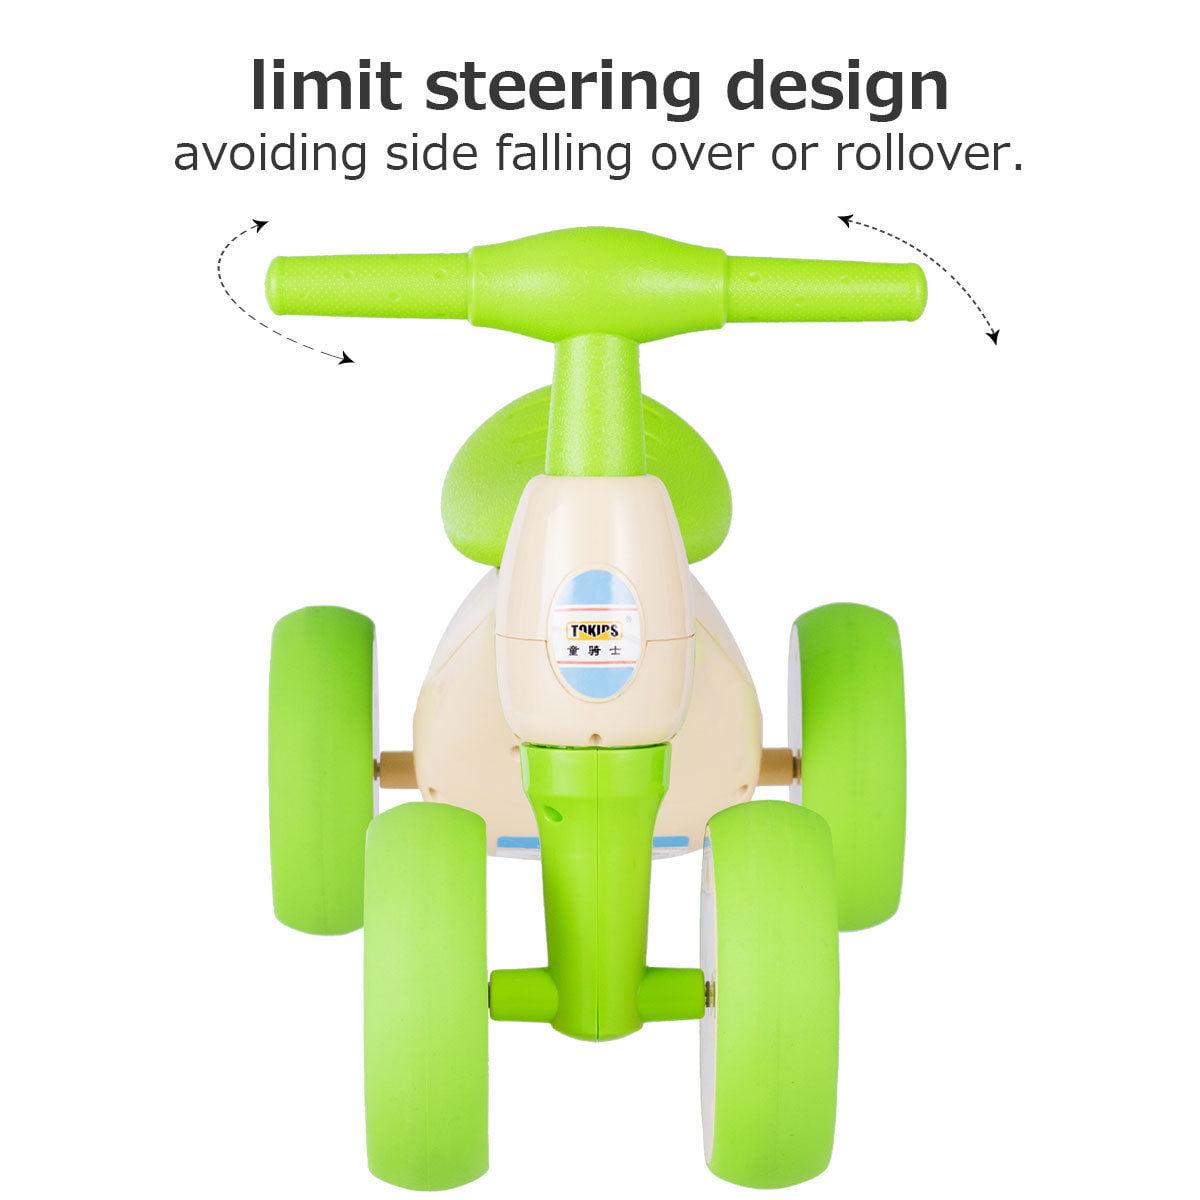 Costway Baby Balance Bike No Pedal Bicycle Children Walker 4 Wheels w/ Sound & Storage - image 1 de 10